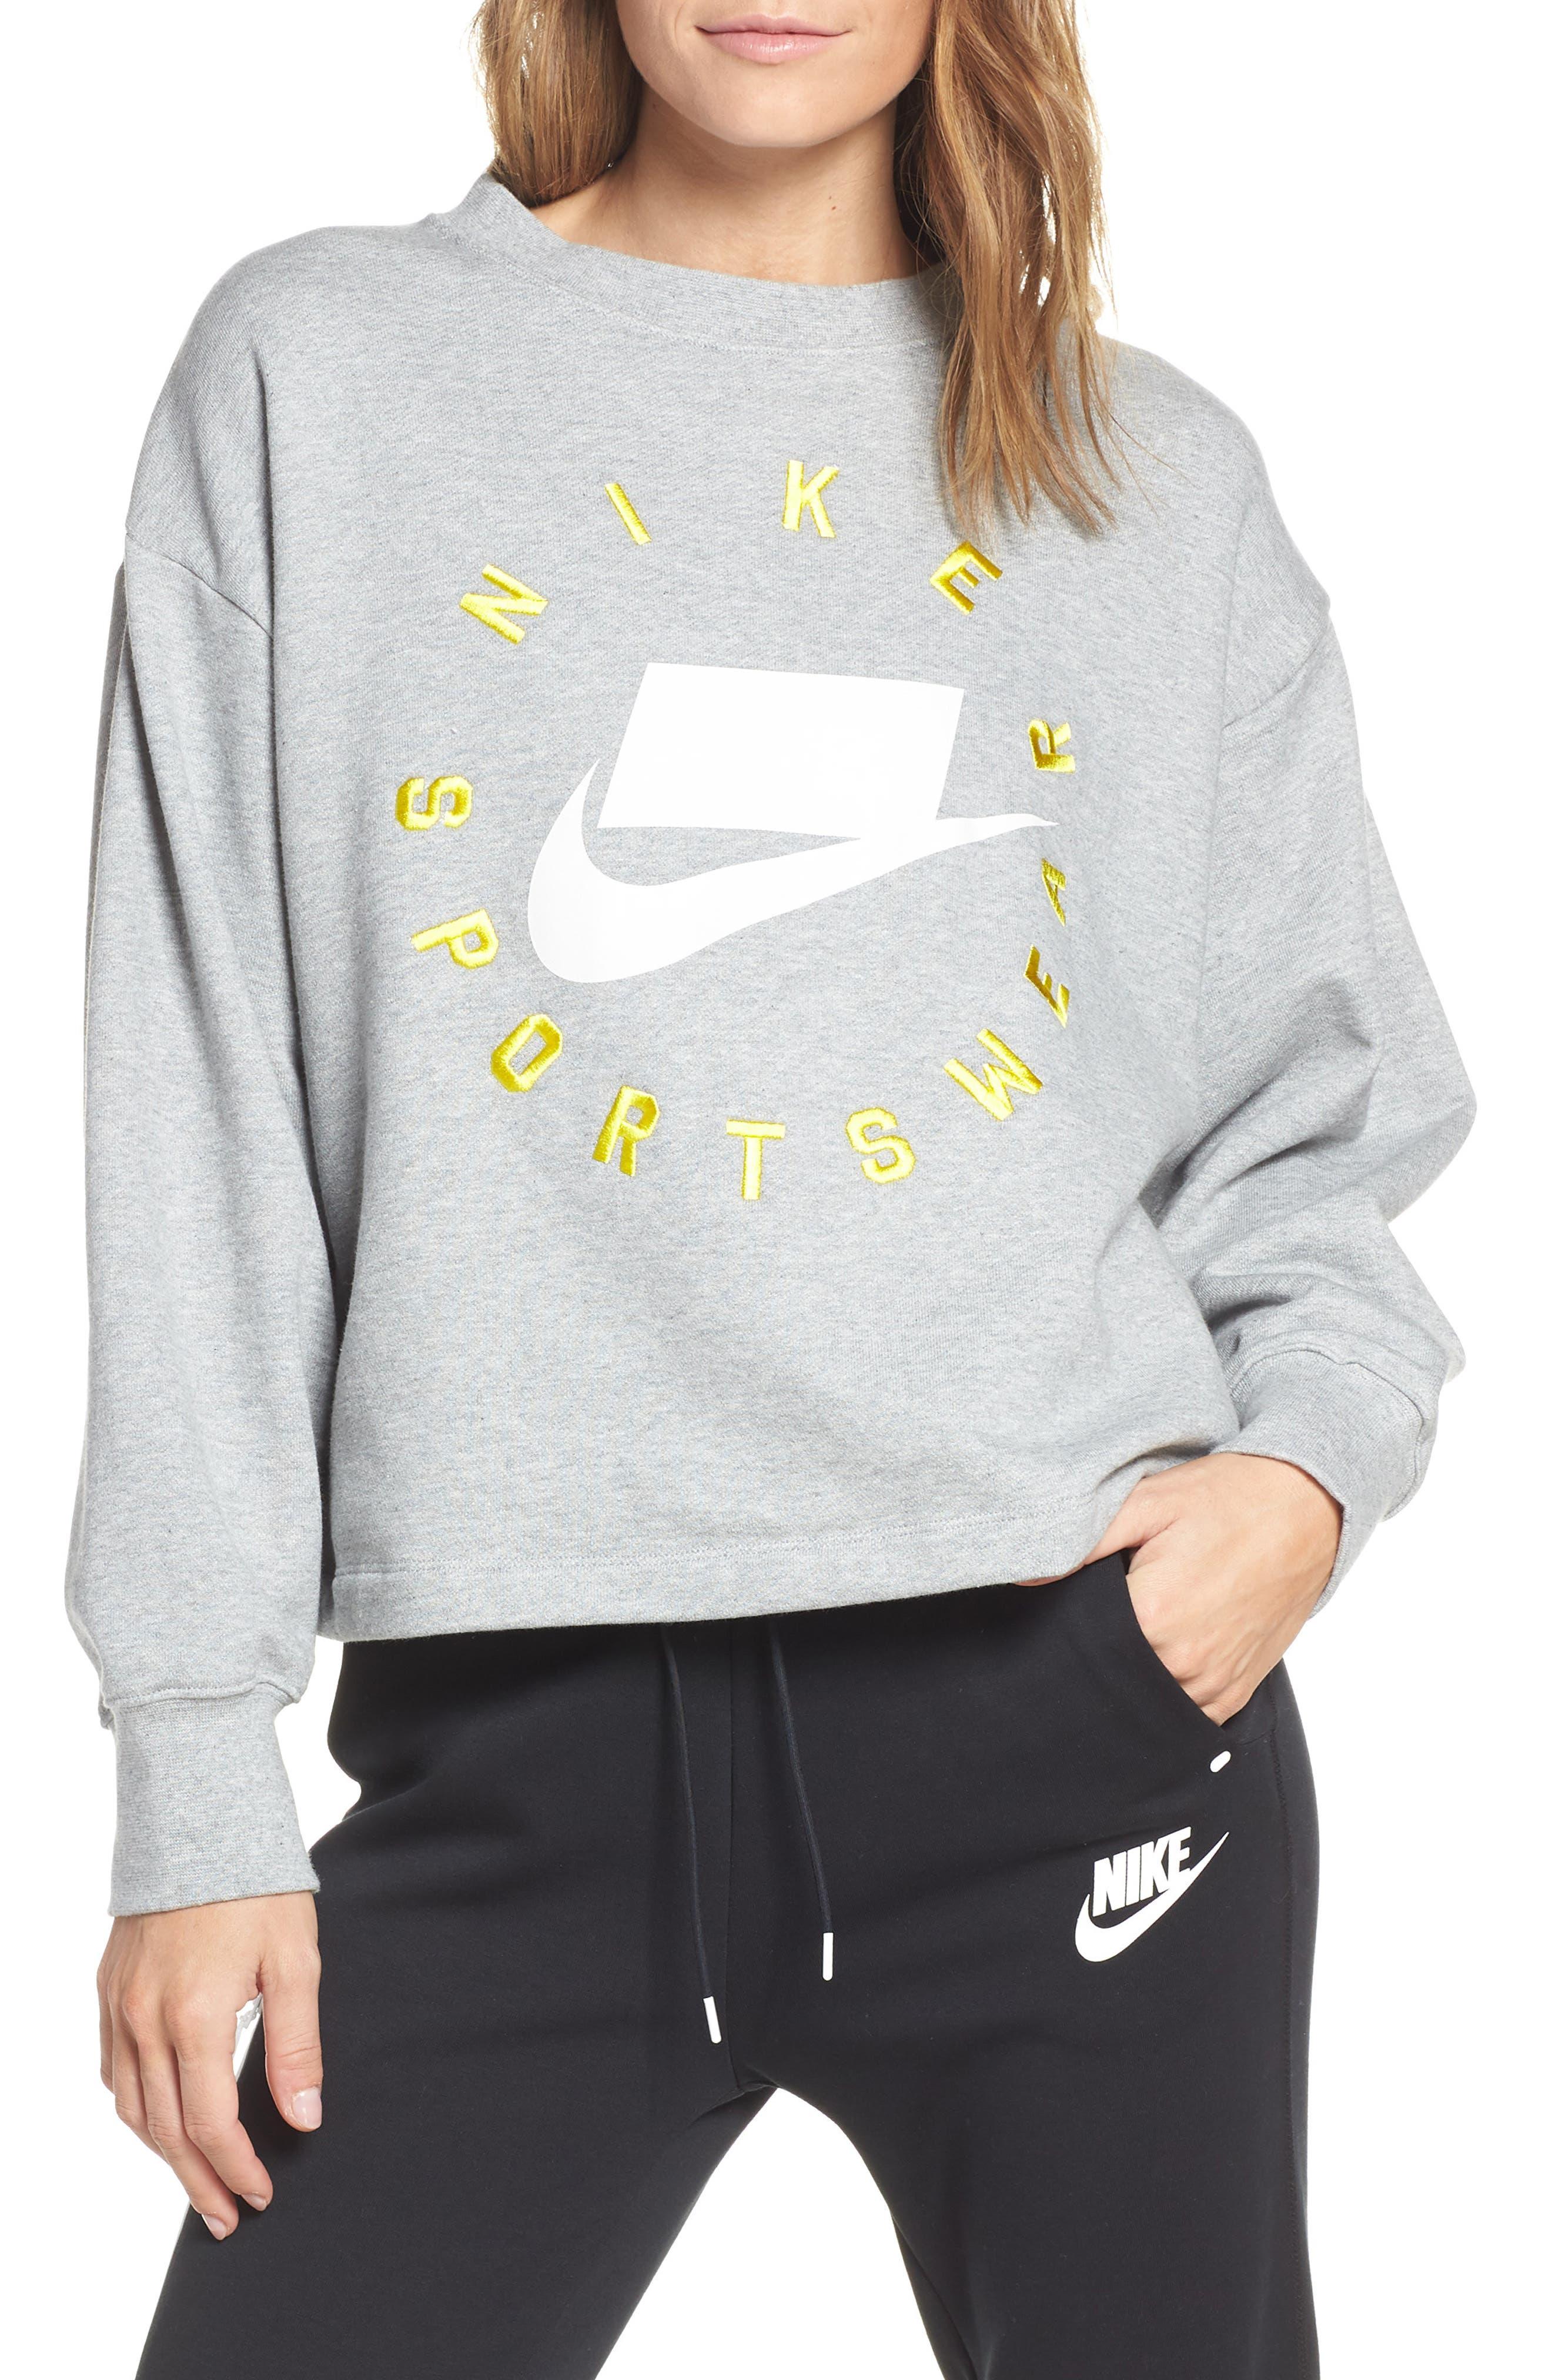 NIKE Sportswear Logo Oversize Sweatshirt, Main, color, DARK GREY HEATHER